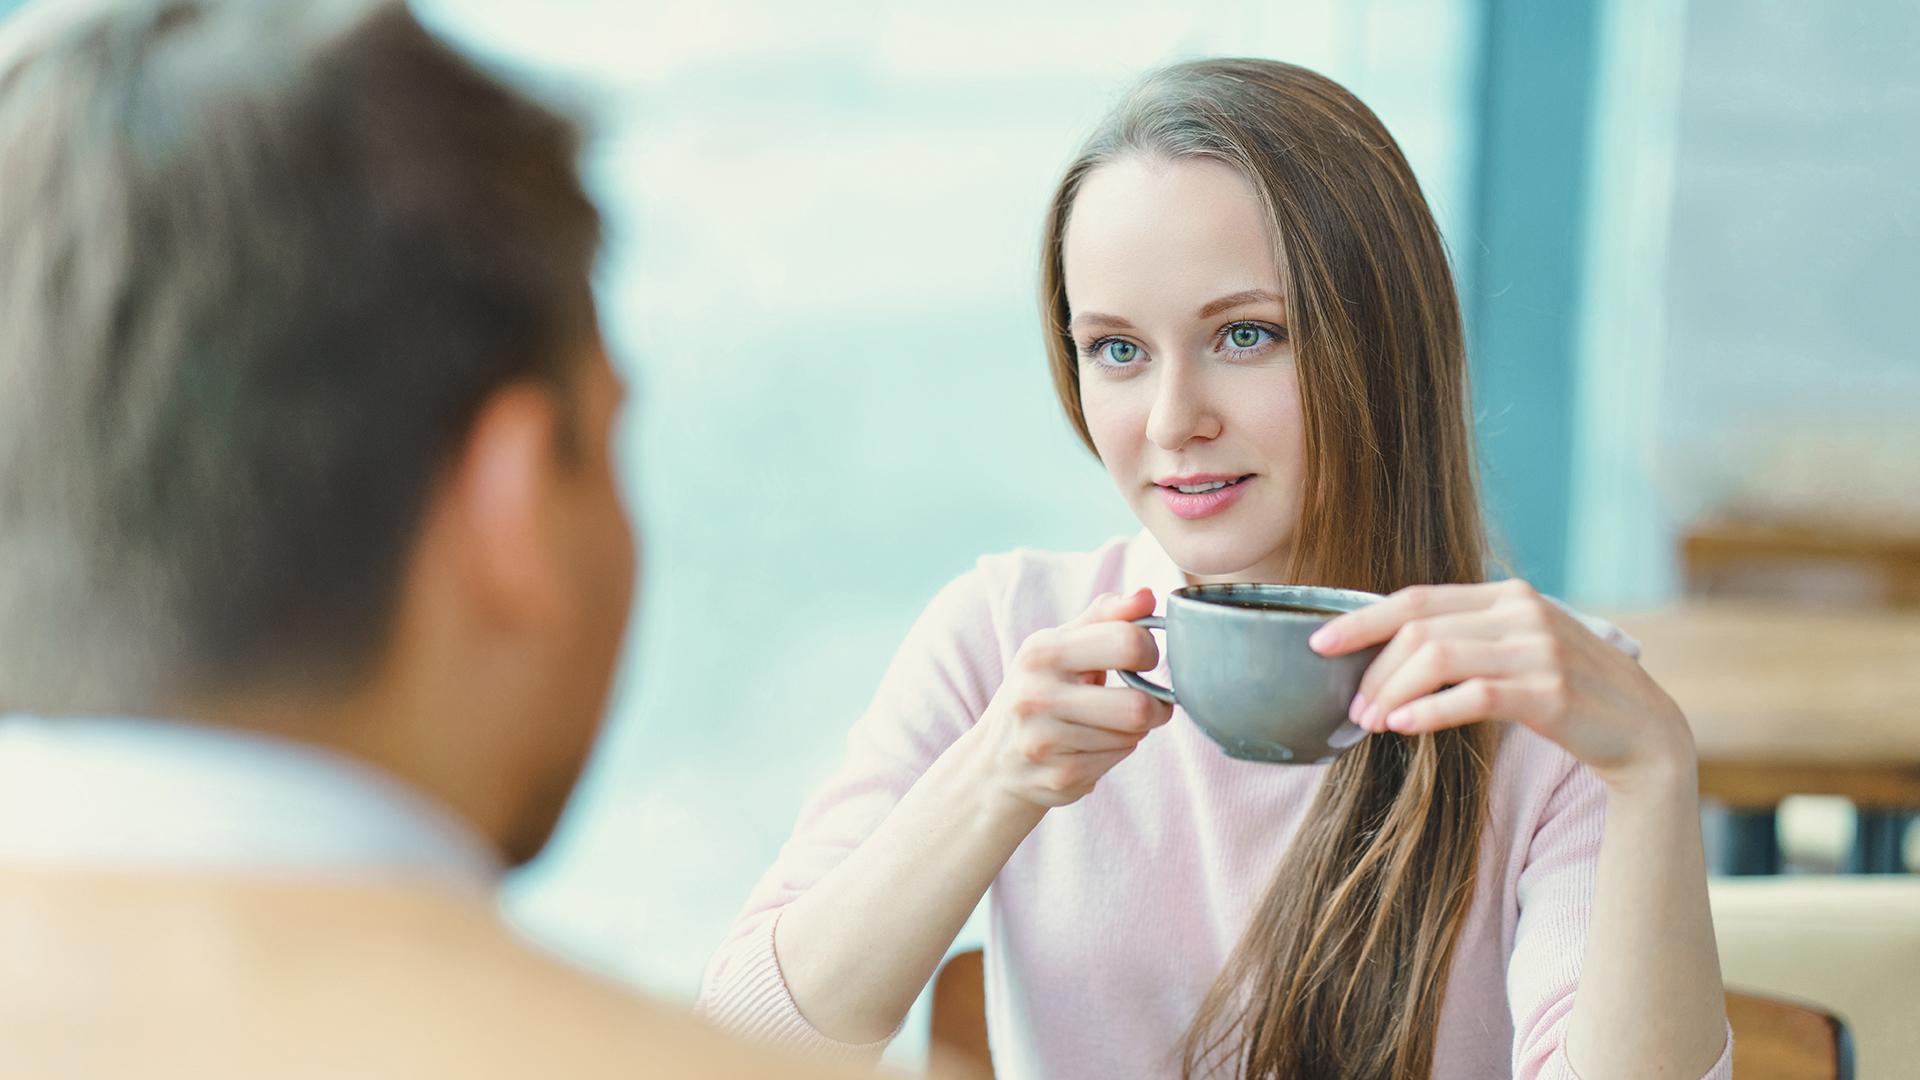 İzmirde Evlilik Terapisi İzmir